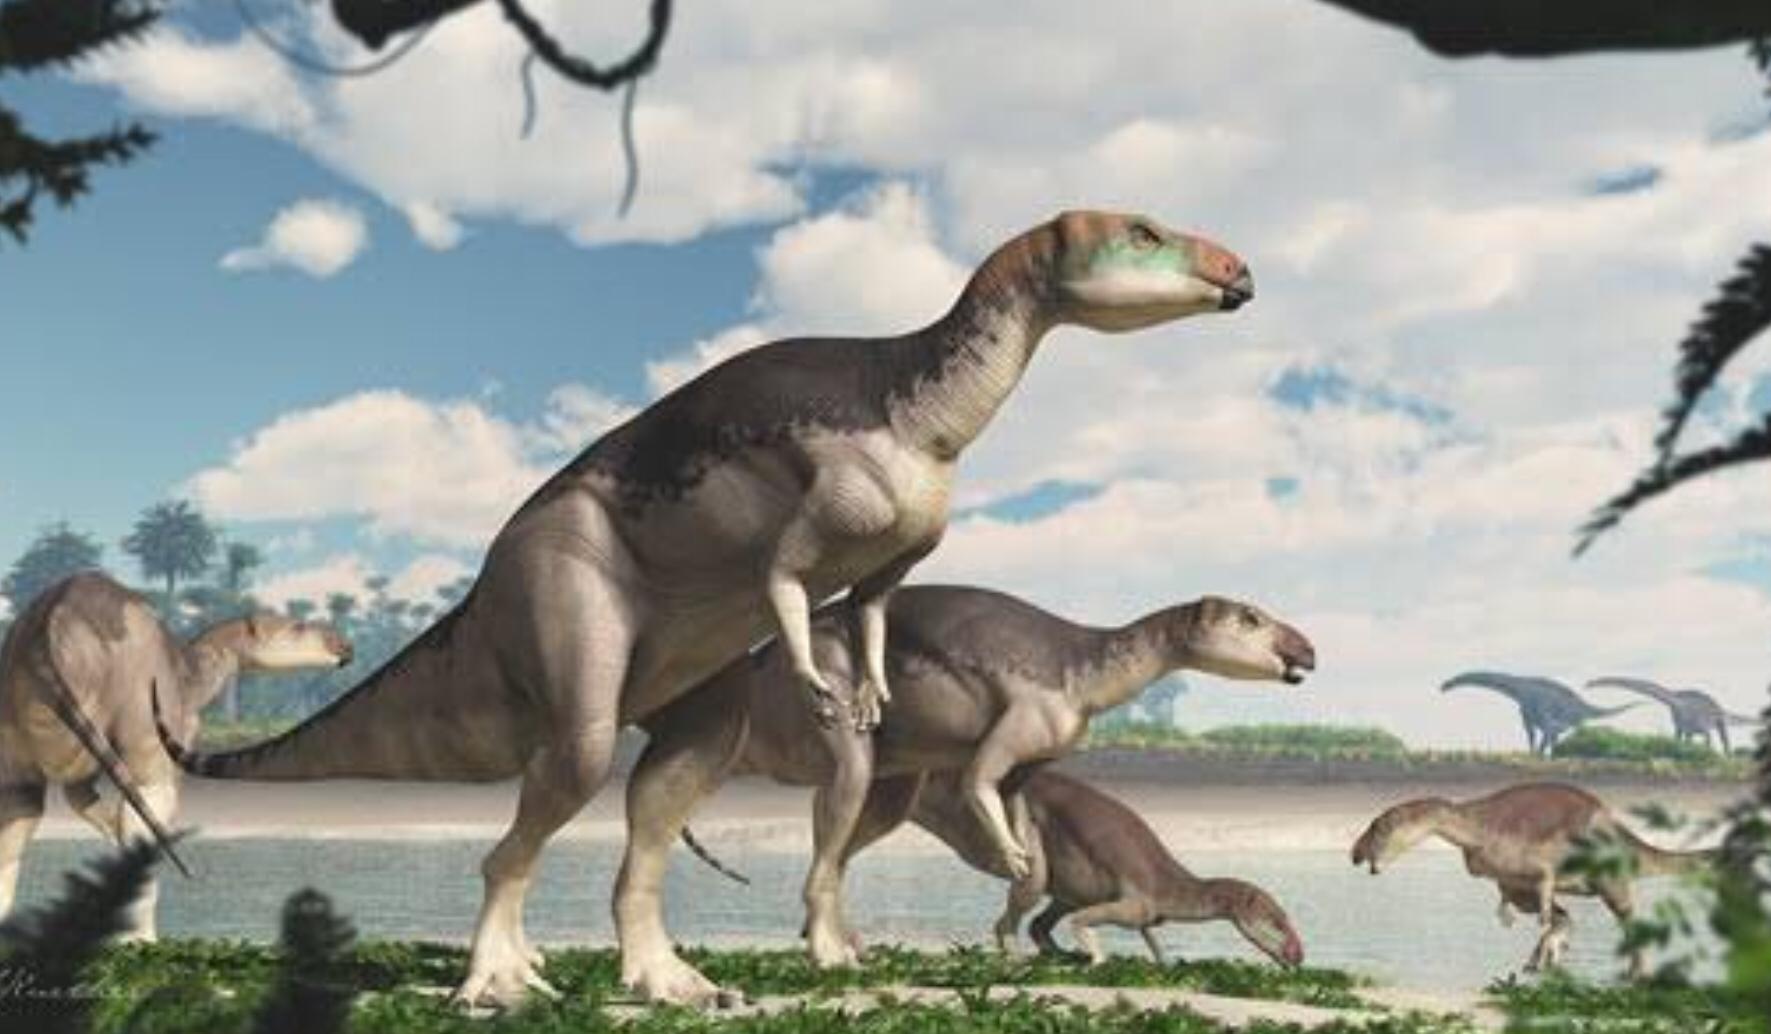 New Dinosaur species found in NSW Australia!